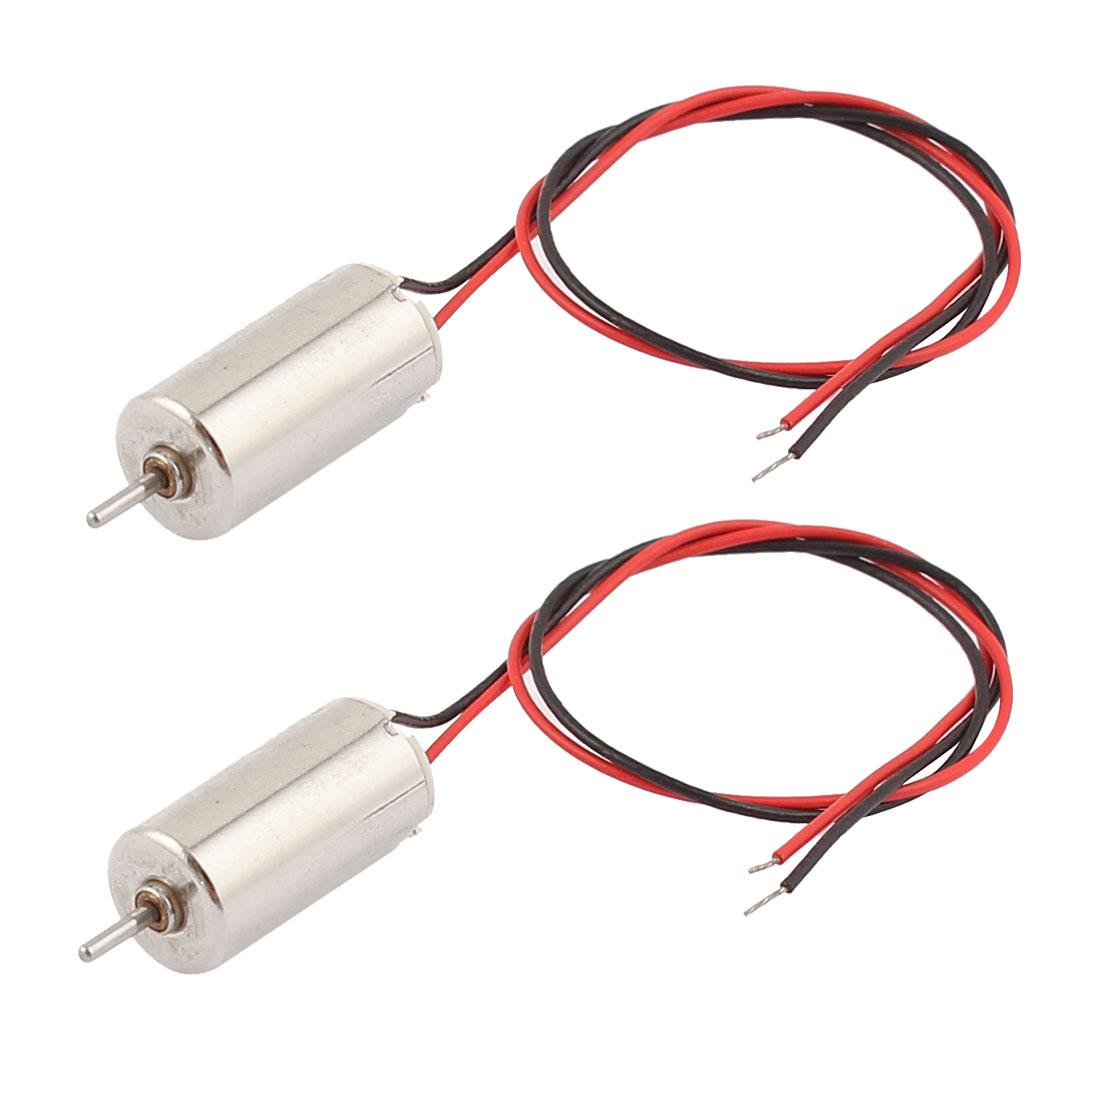 2 Pcs DC 1.5V-4.5V 44273RPM 2-Wire Cylinder Coreless Motor 6mmx12mm